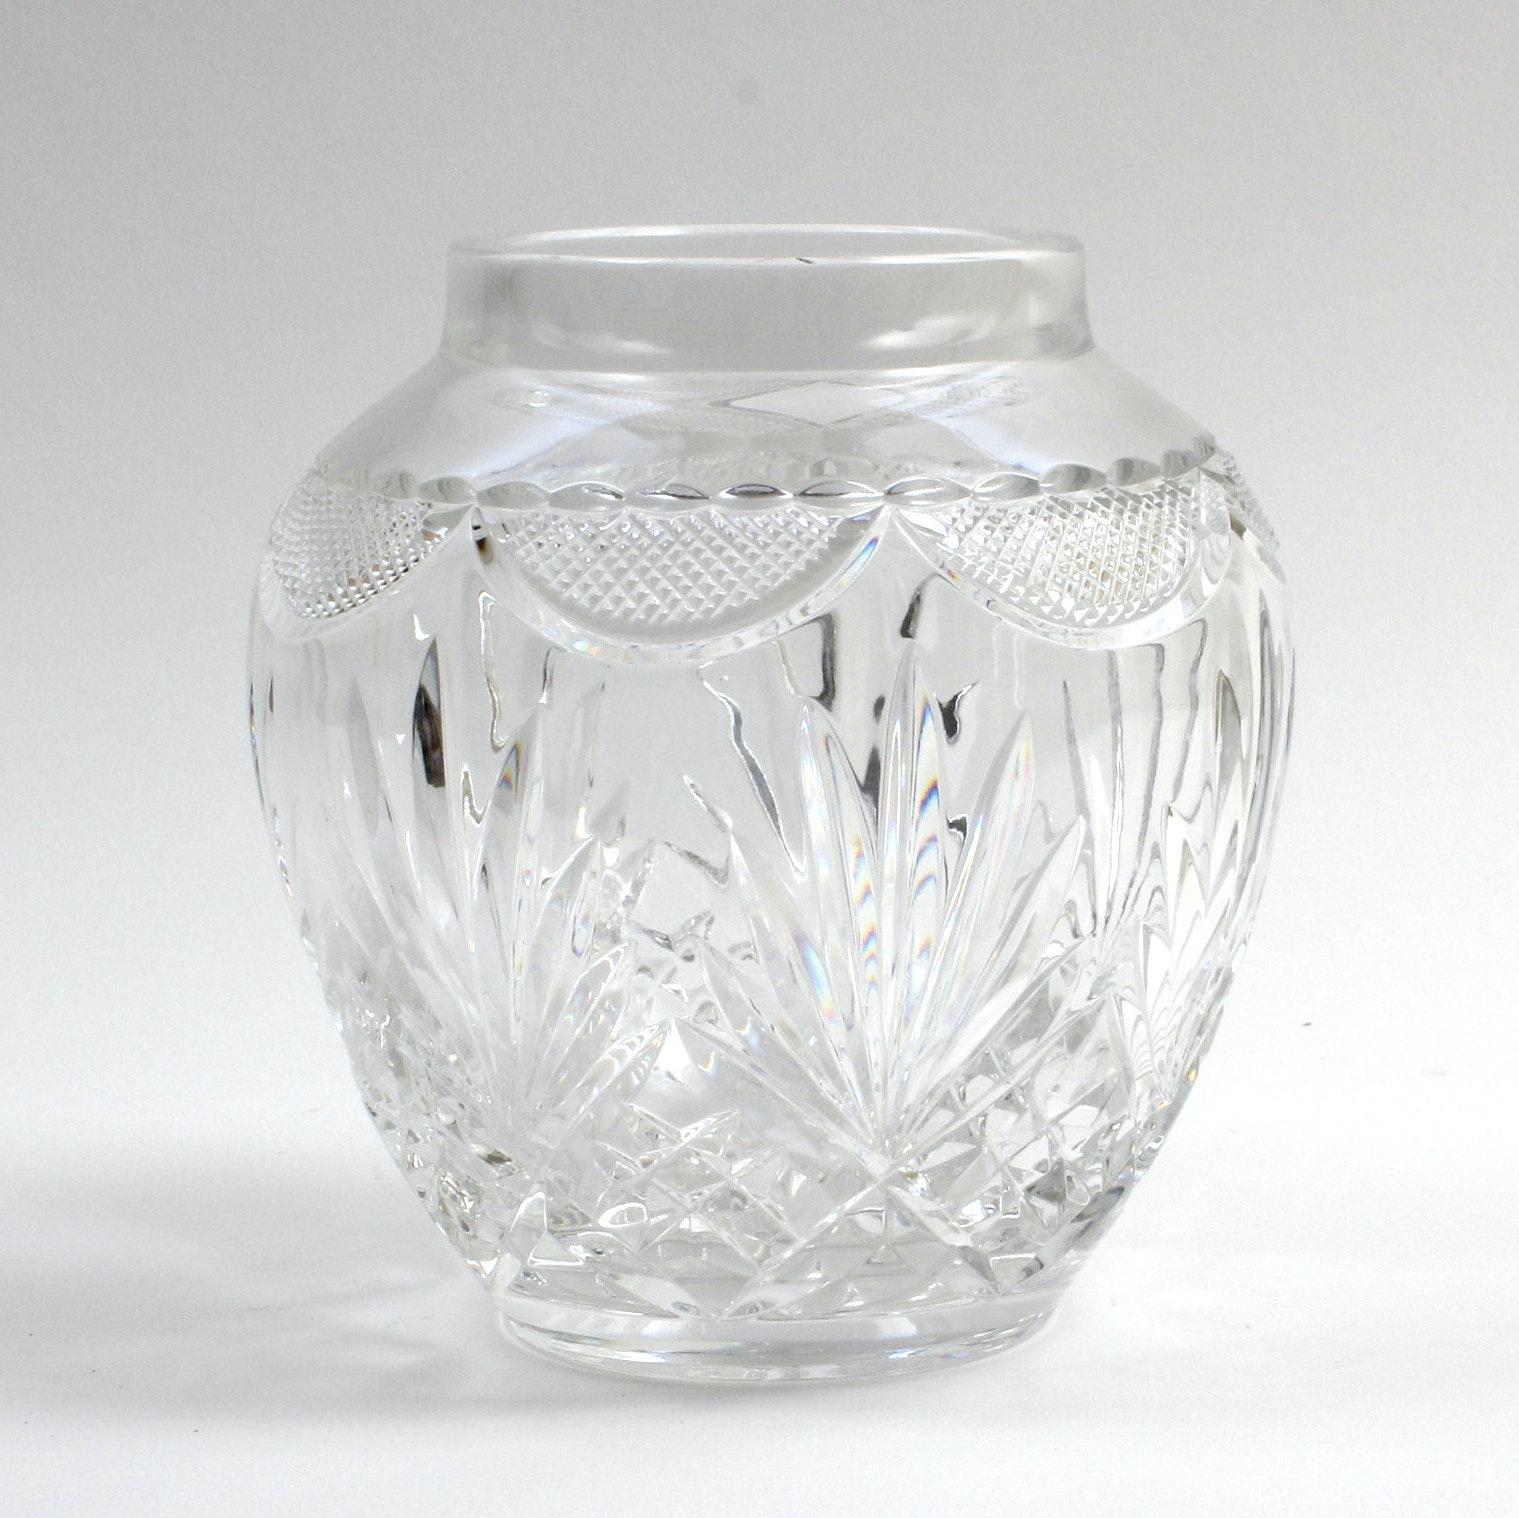 Hand-Cut Lead Crystal Vase